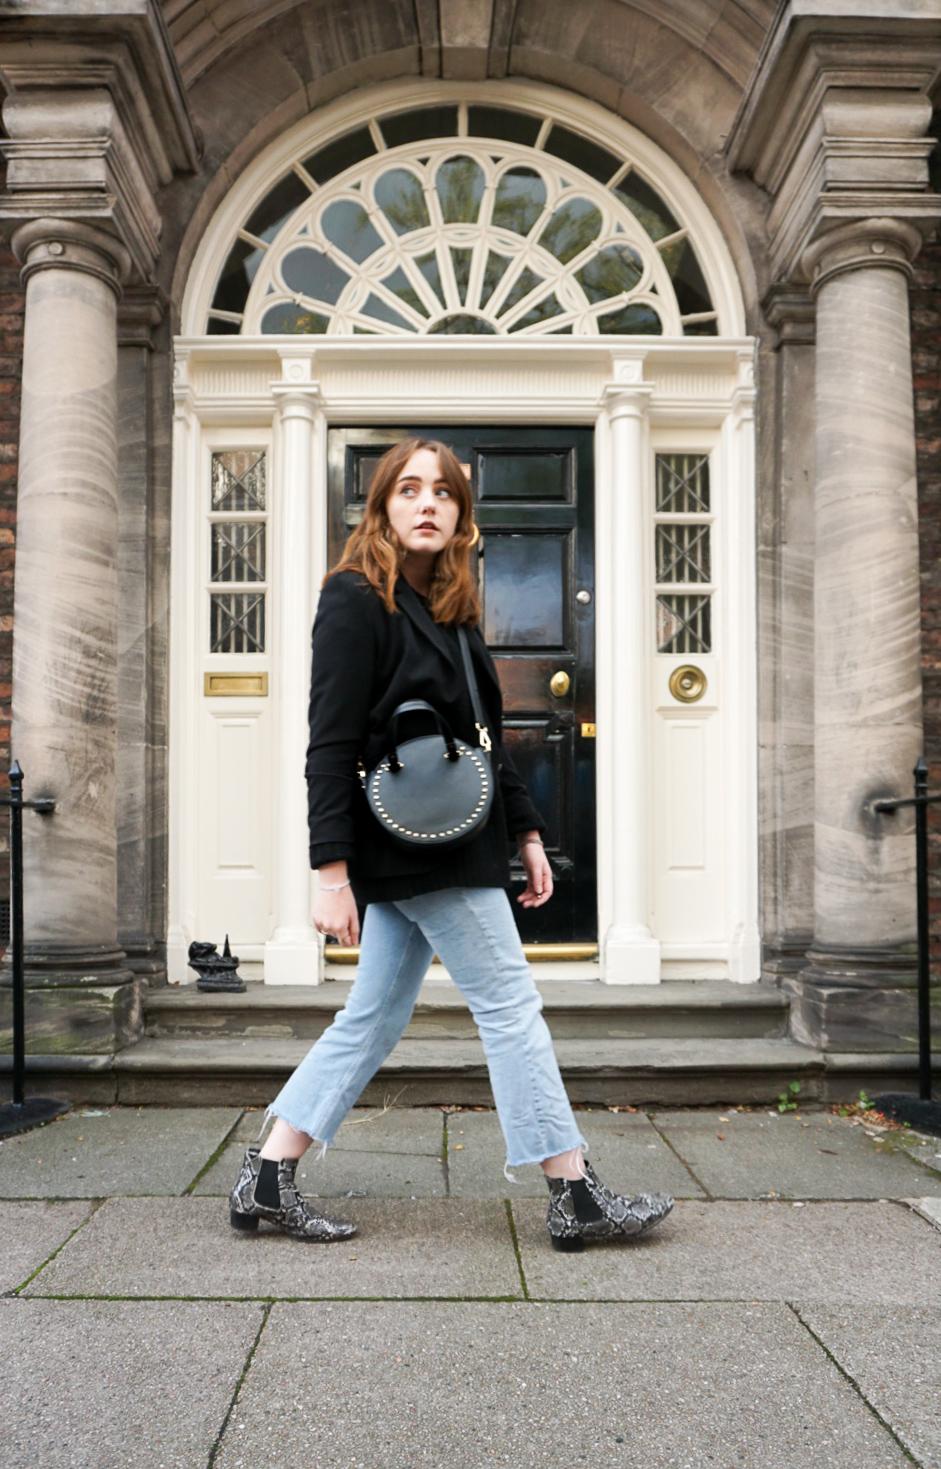 autumn 2018 street style of uk fashion blogger